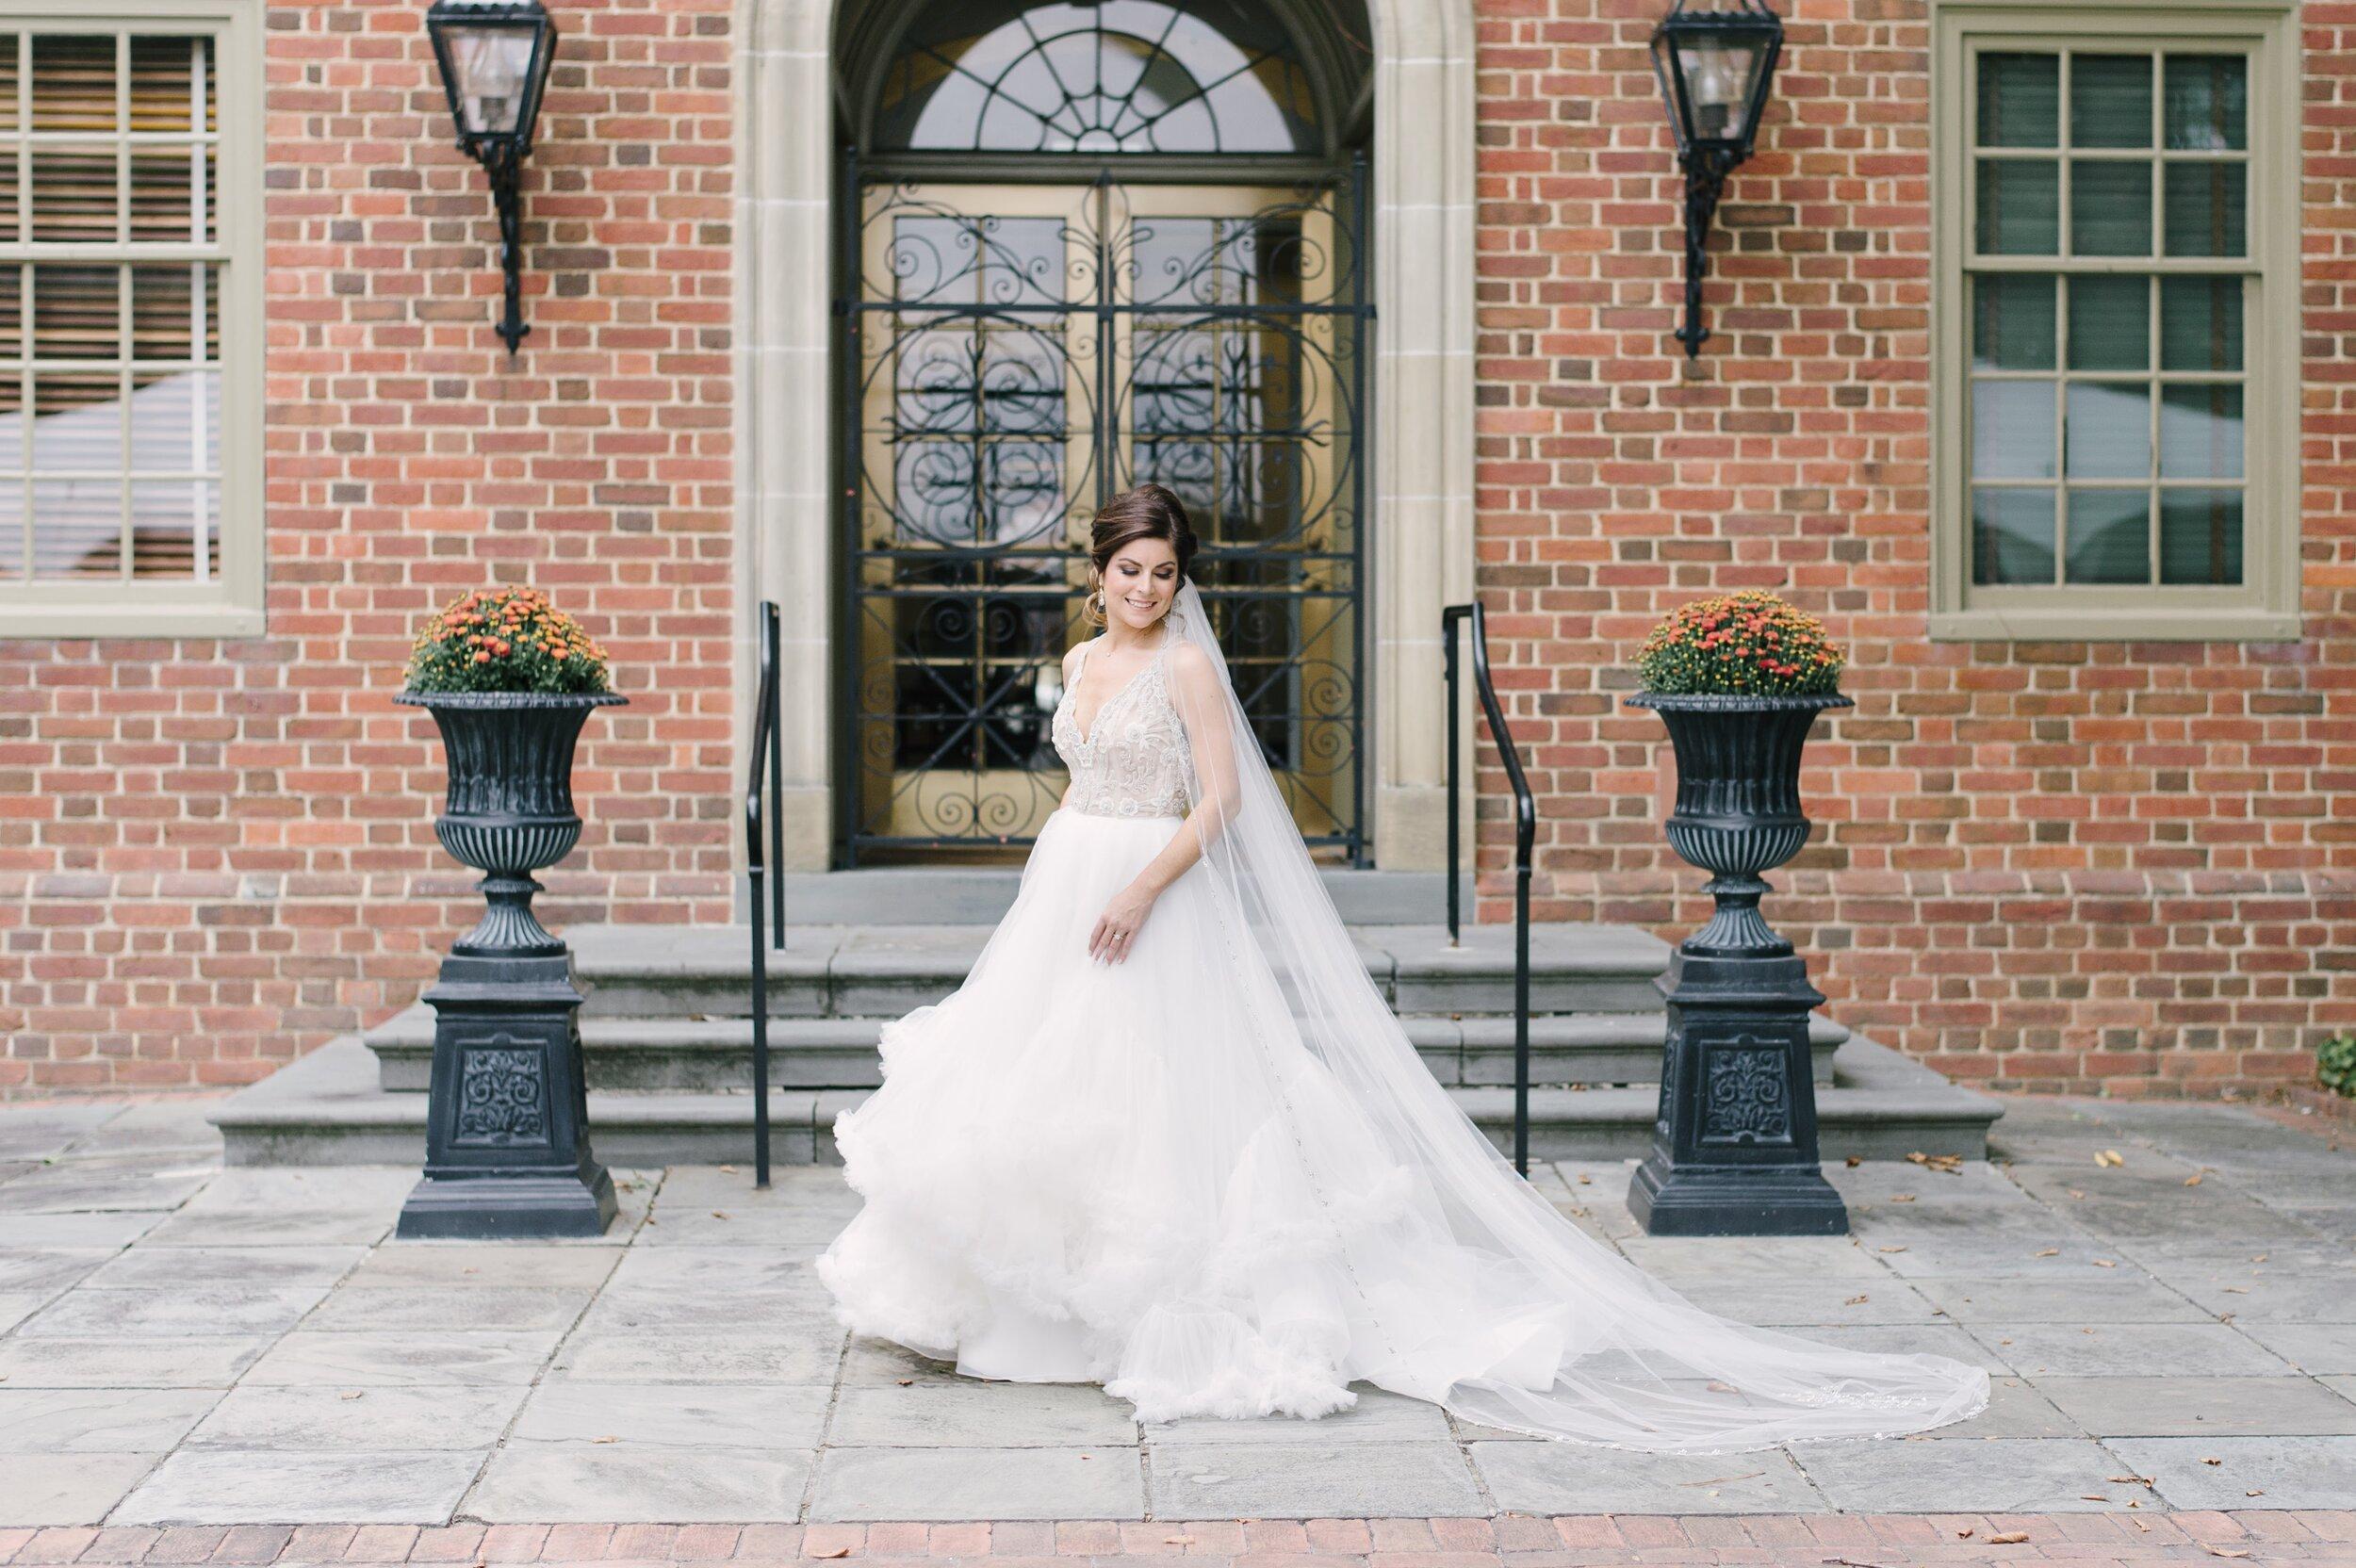 portraits-wedding-sarah-street-photography-5.jpg